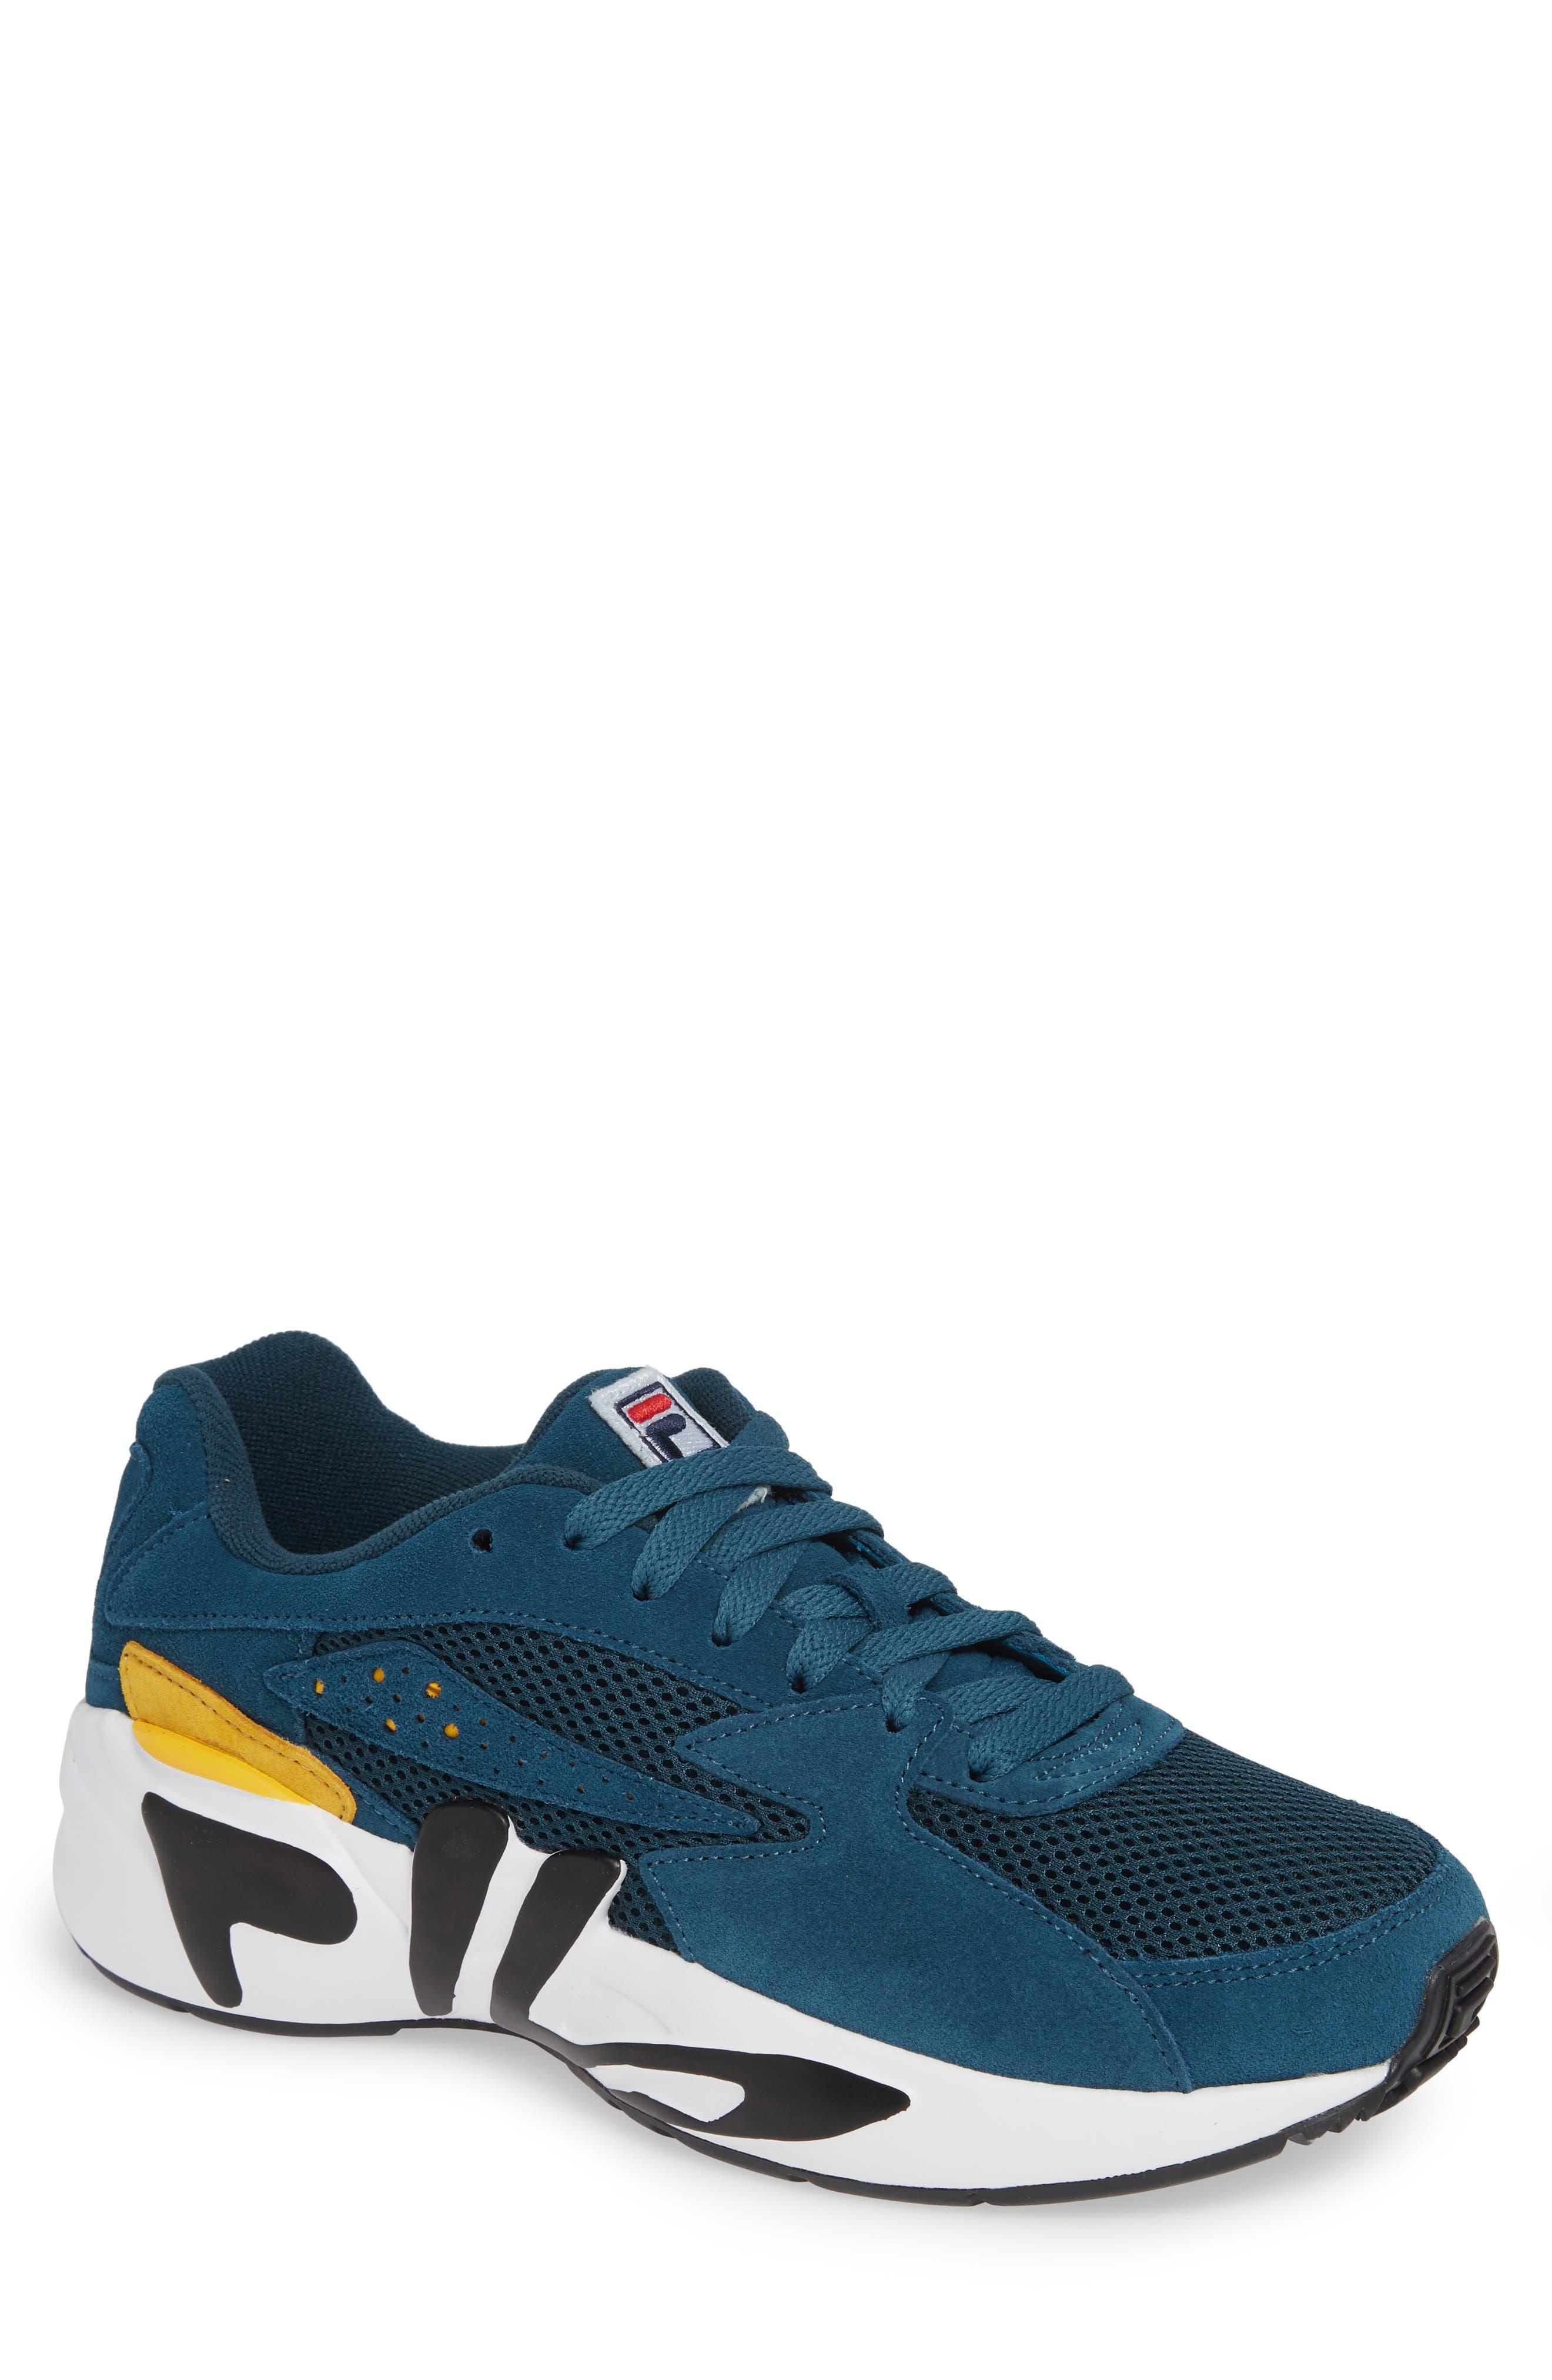 Mindblower Sneaker,                             Main thumbnail 1, color,                             WHITE/ BLACK